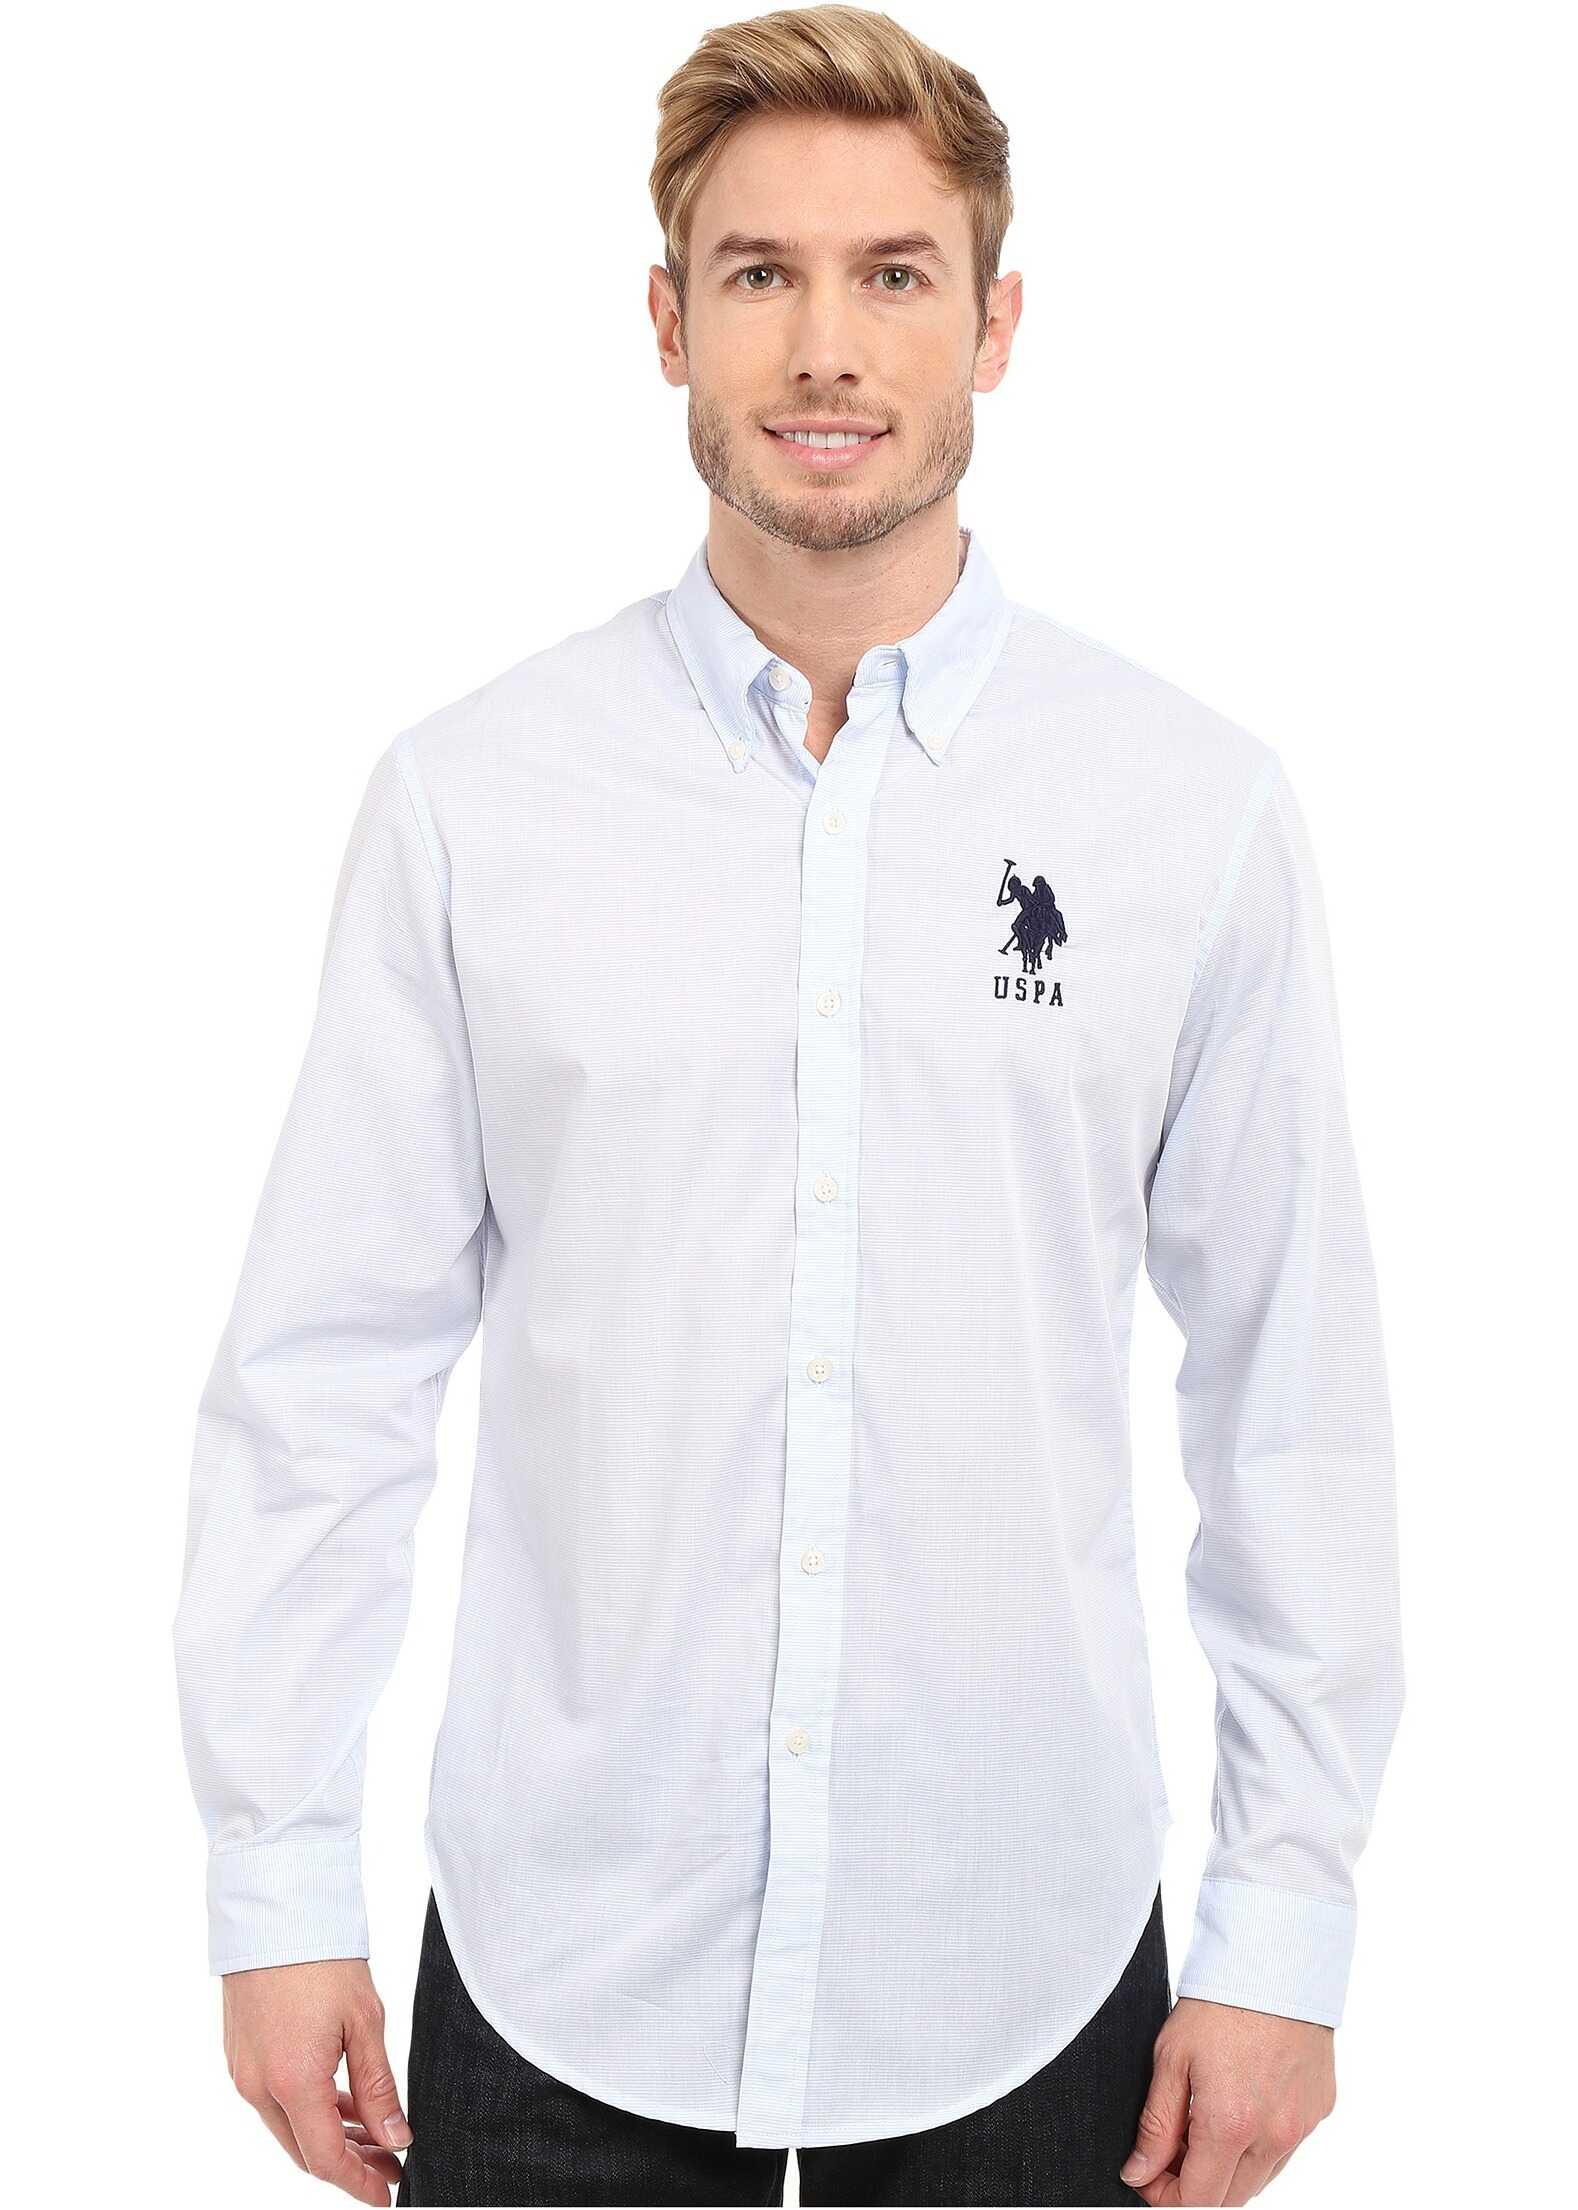 U.S. POLO ASSN. Slim Fit Striped Oxford Button Down Shirt Vista Blue